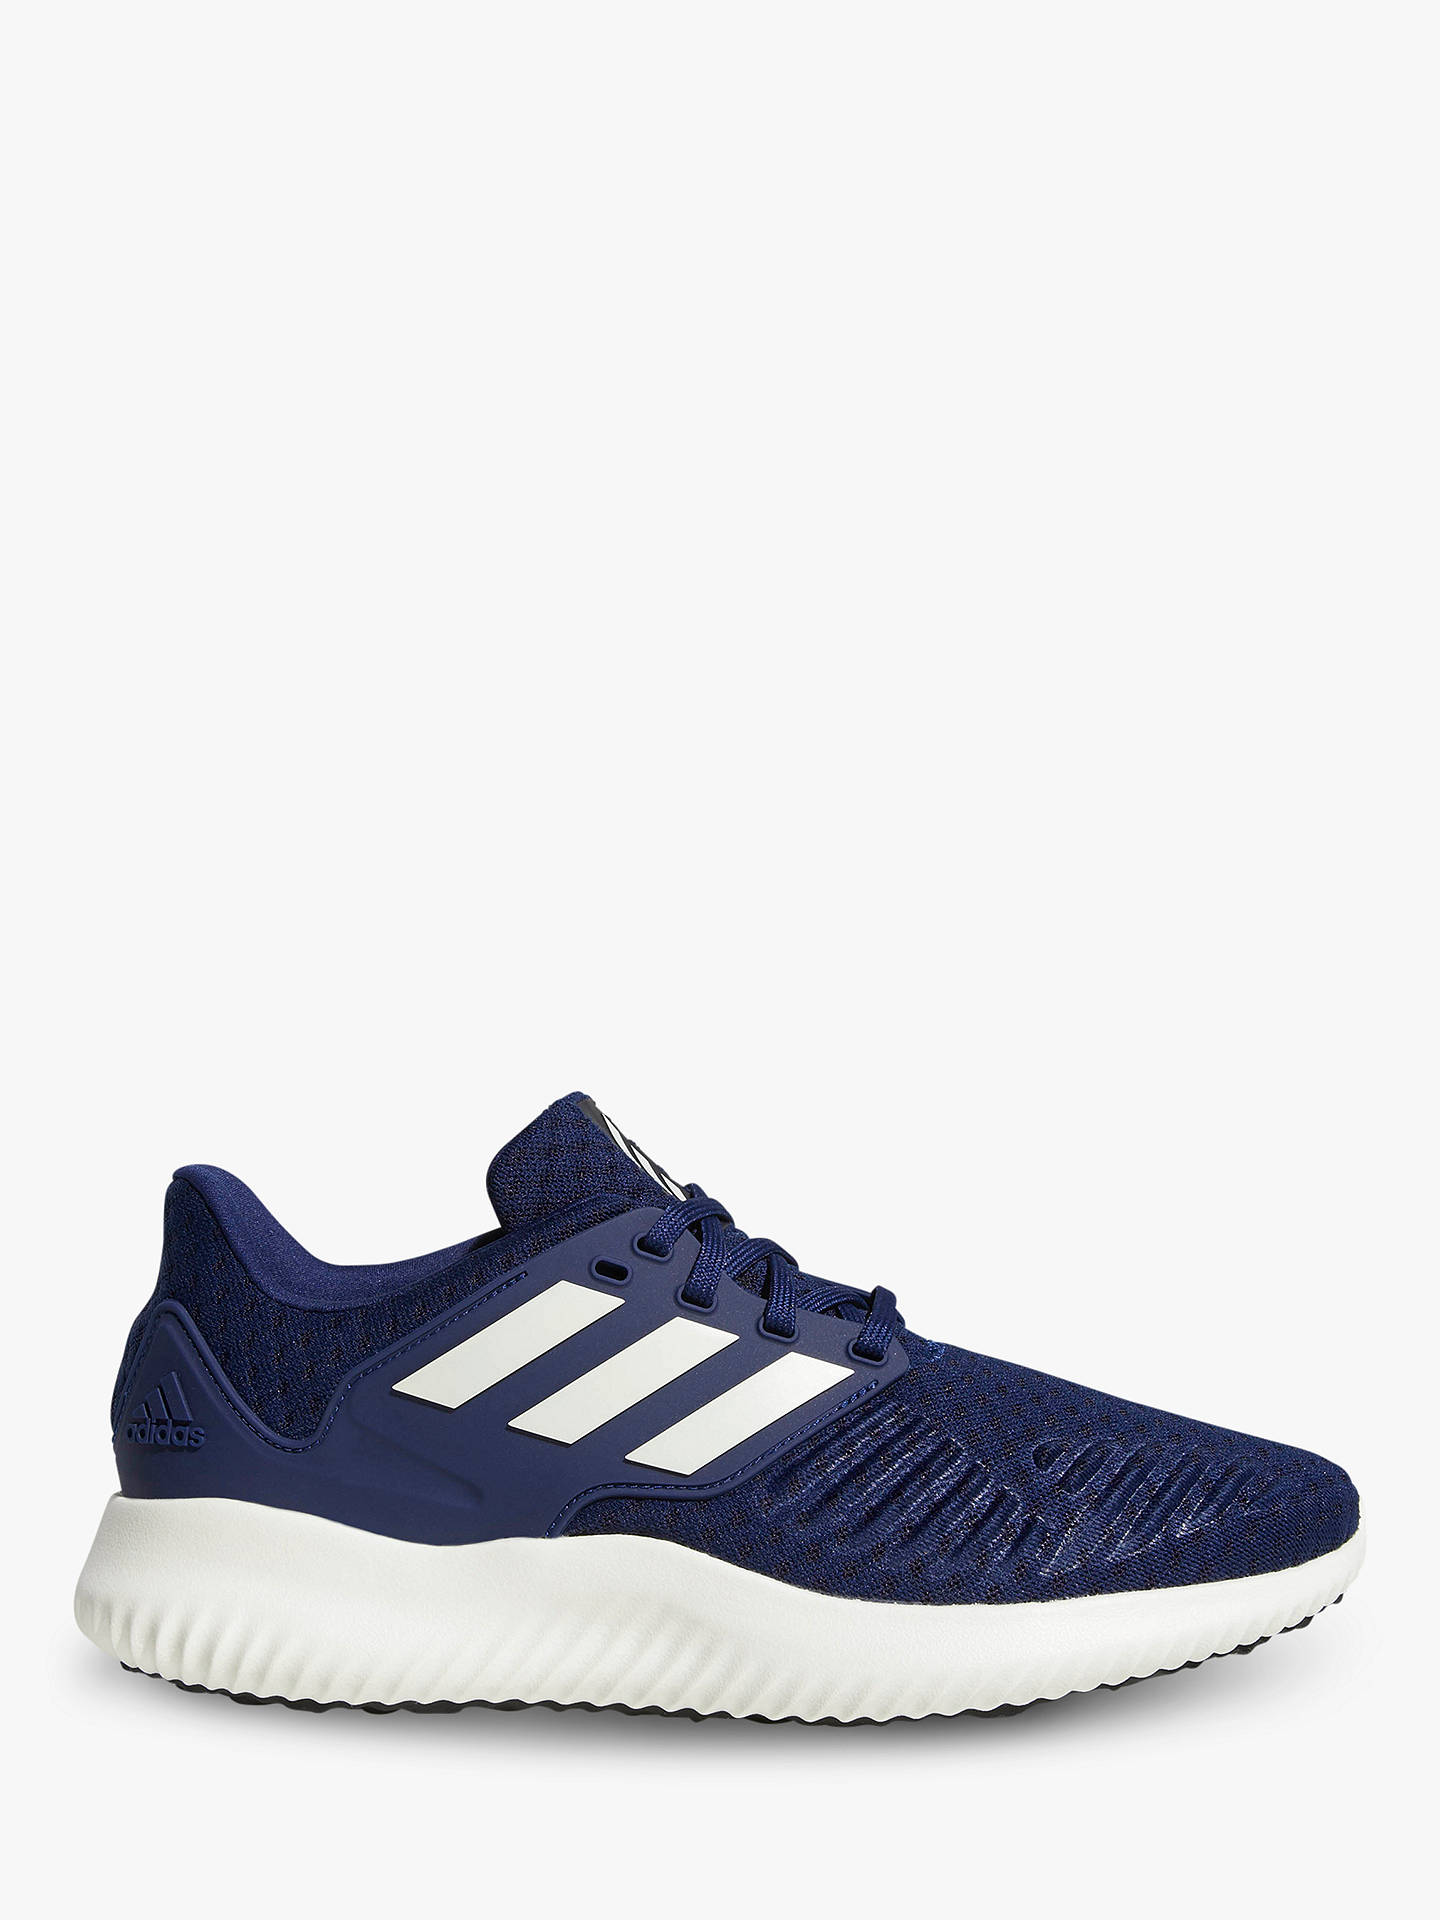 abb9bb532 Buy adidas Alphabounce 2.0 Men s Running Shoes